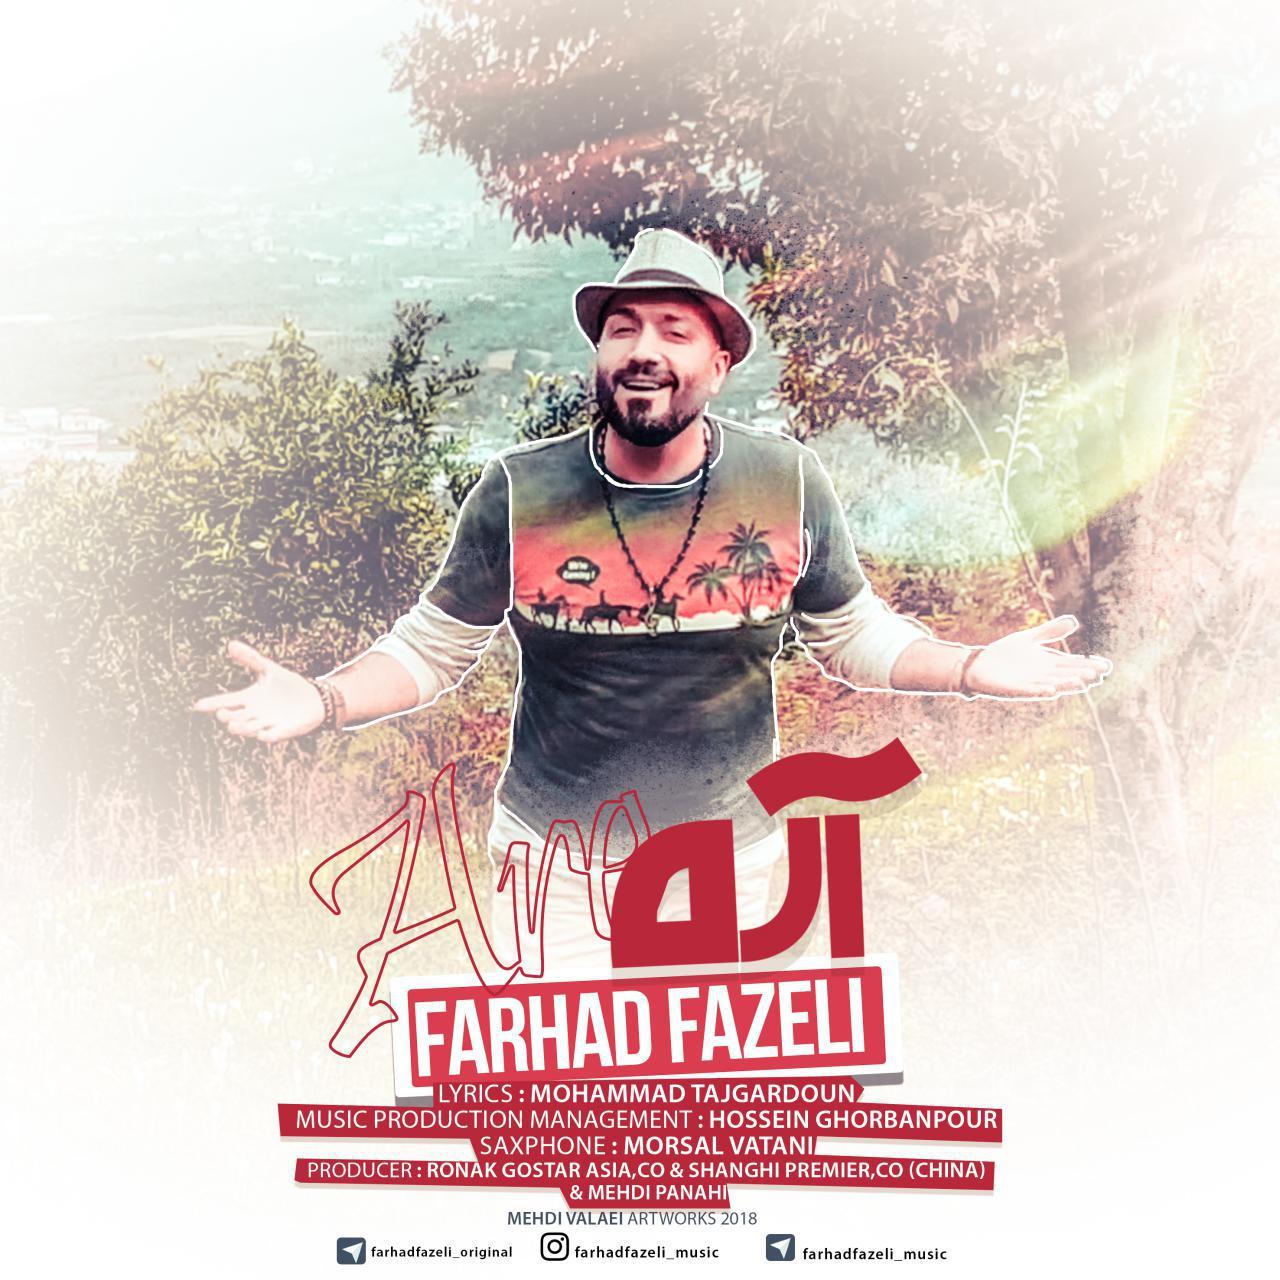 http://www.ganja2music.com/Image/Post/1.2018/Farhad%20Fazeli%20-%20Are.jpg